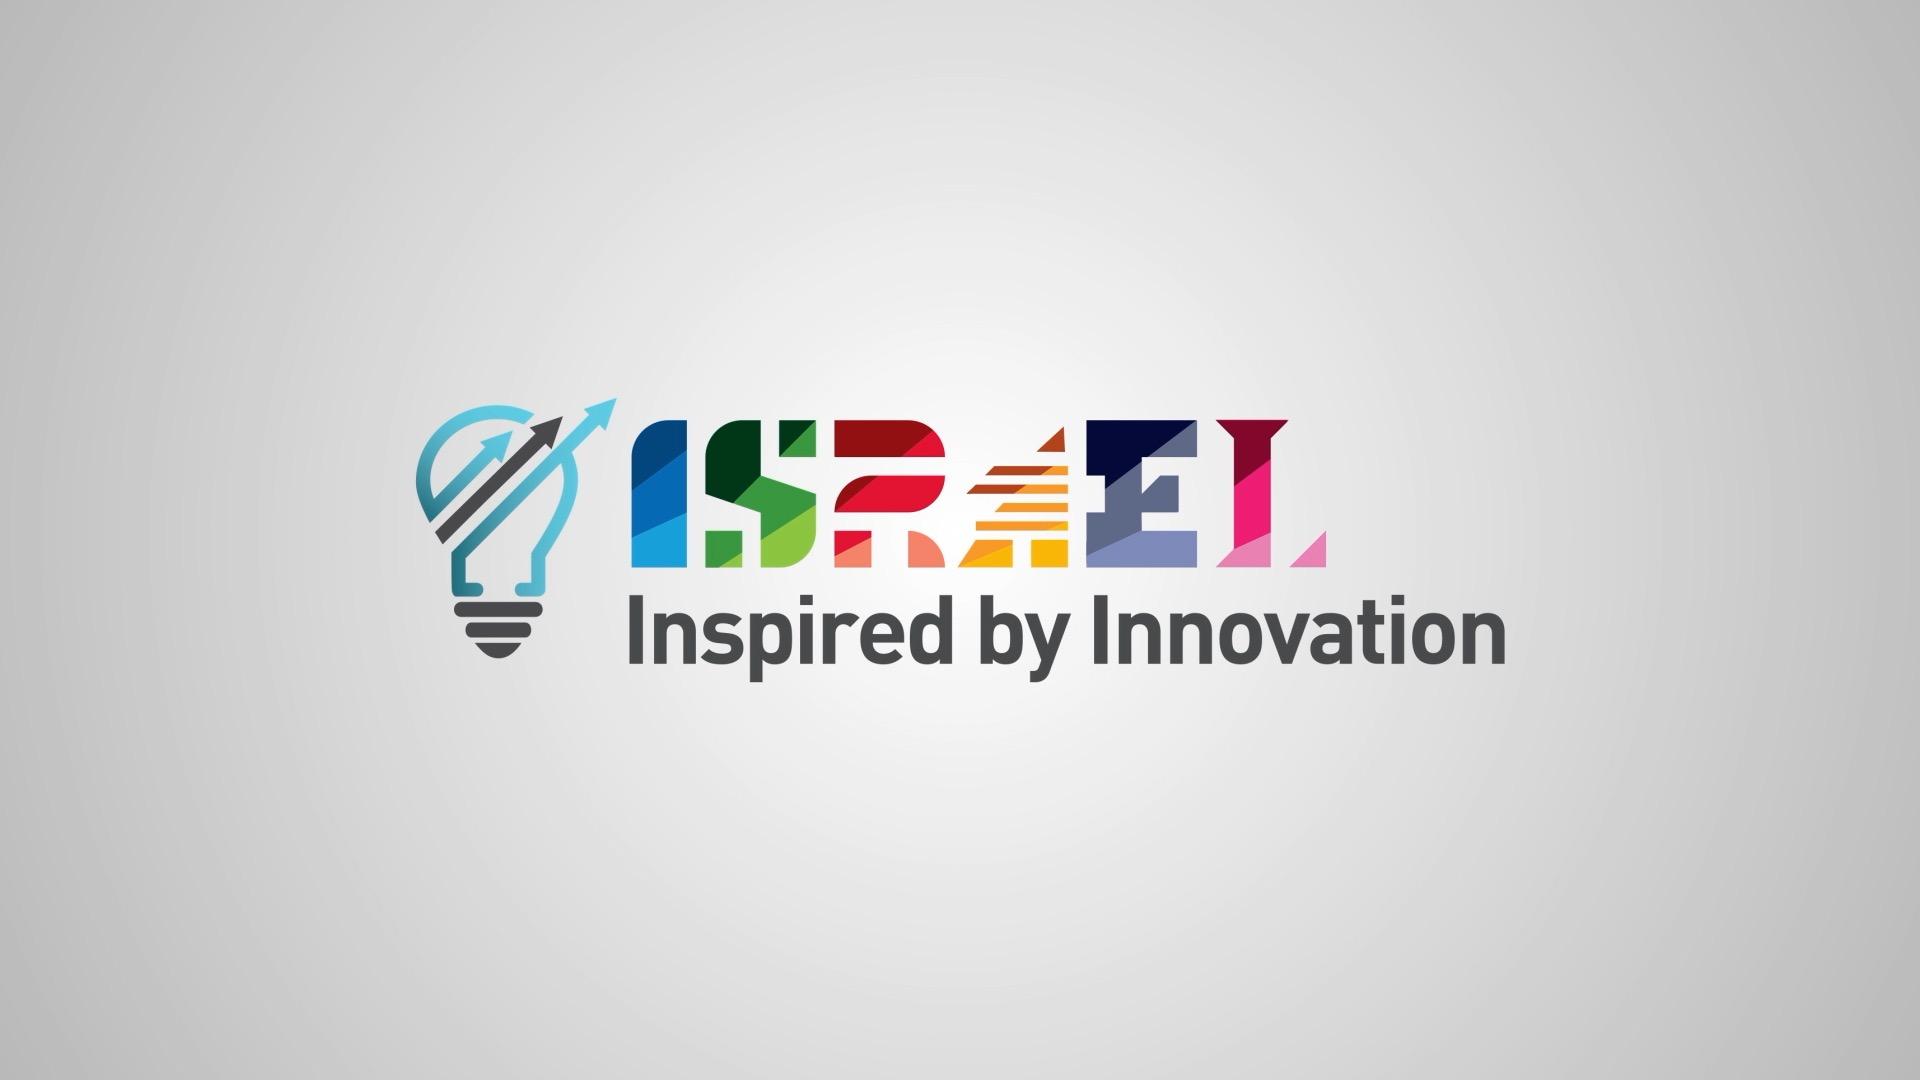 Israeli Innovation